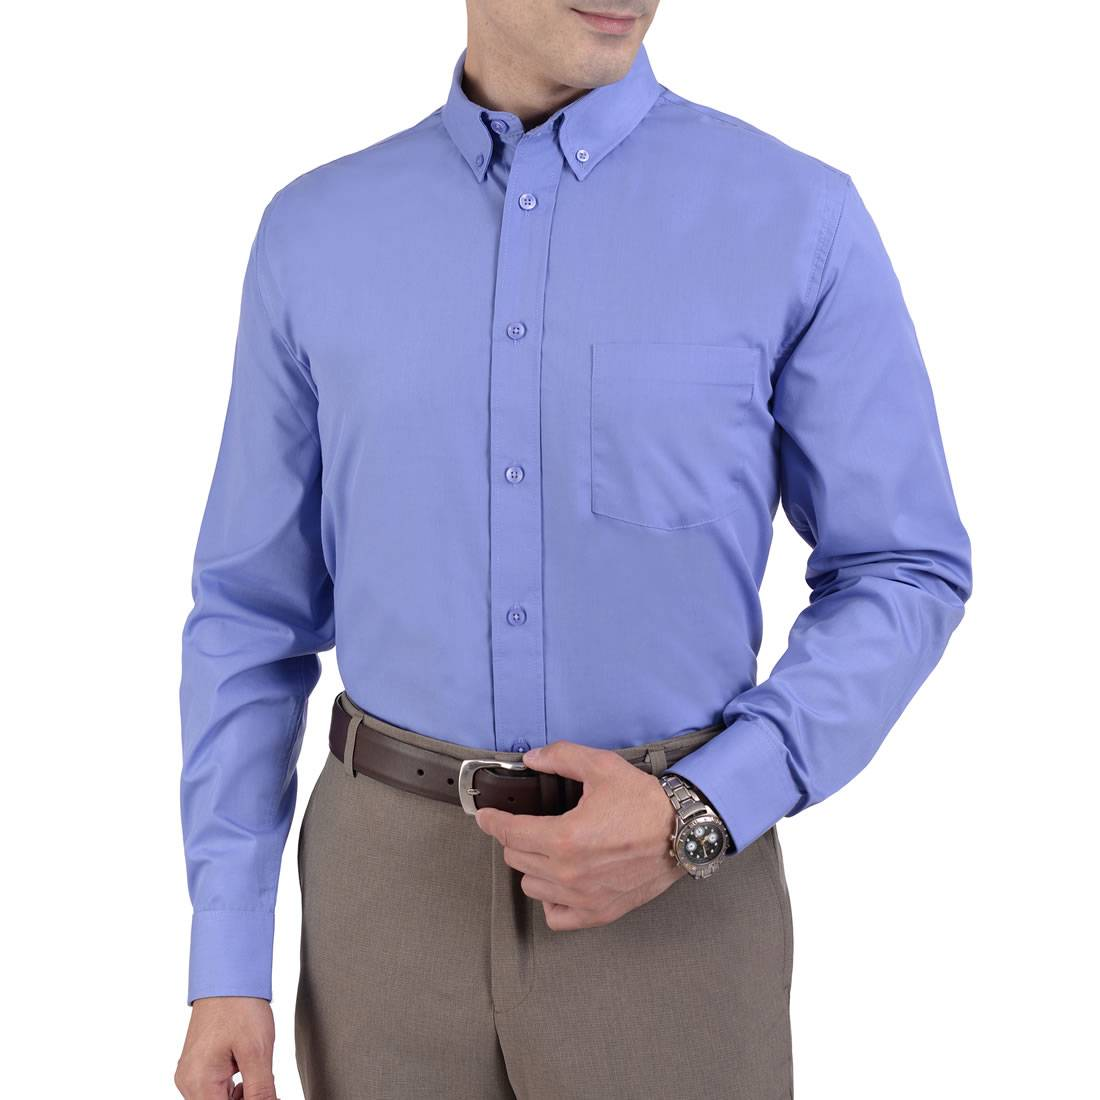 041923422023-01-Camisa-Manga-Larga-Classic-Fit-Azul-Francia-yale